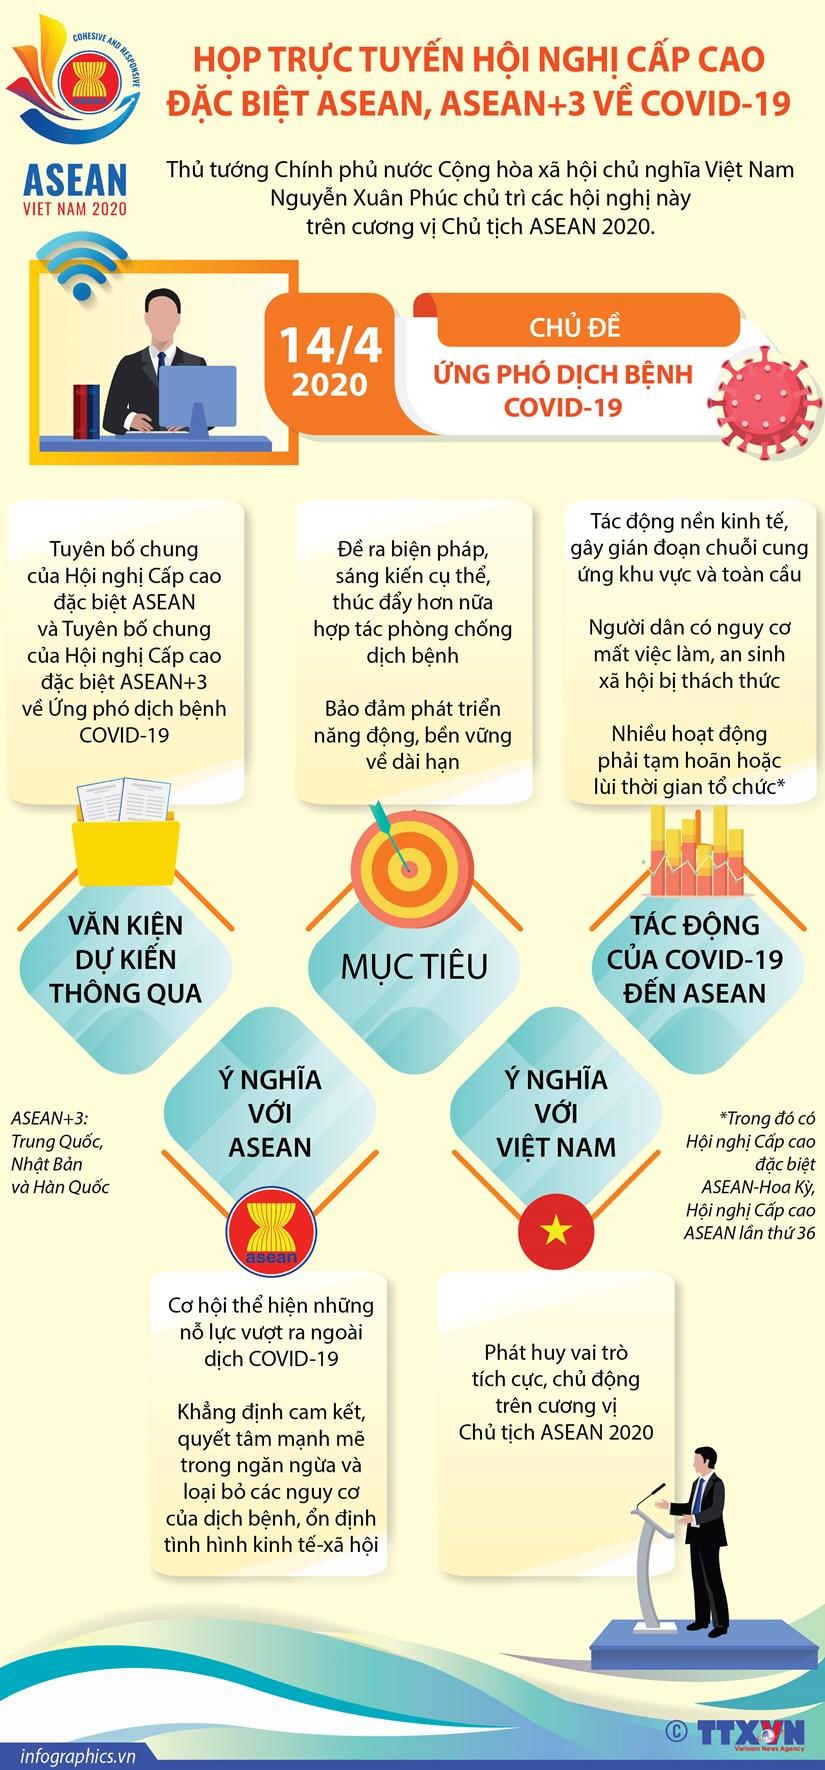 Hop truc tuyen Hoi nghi Cap cao dac biet ASEAN ve COVID-19 hinh anh 1